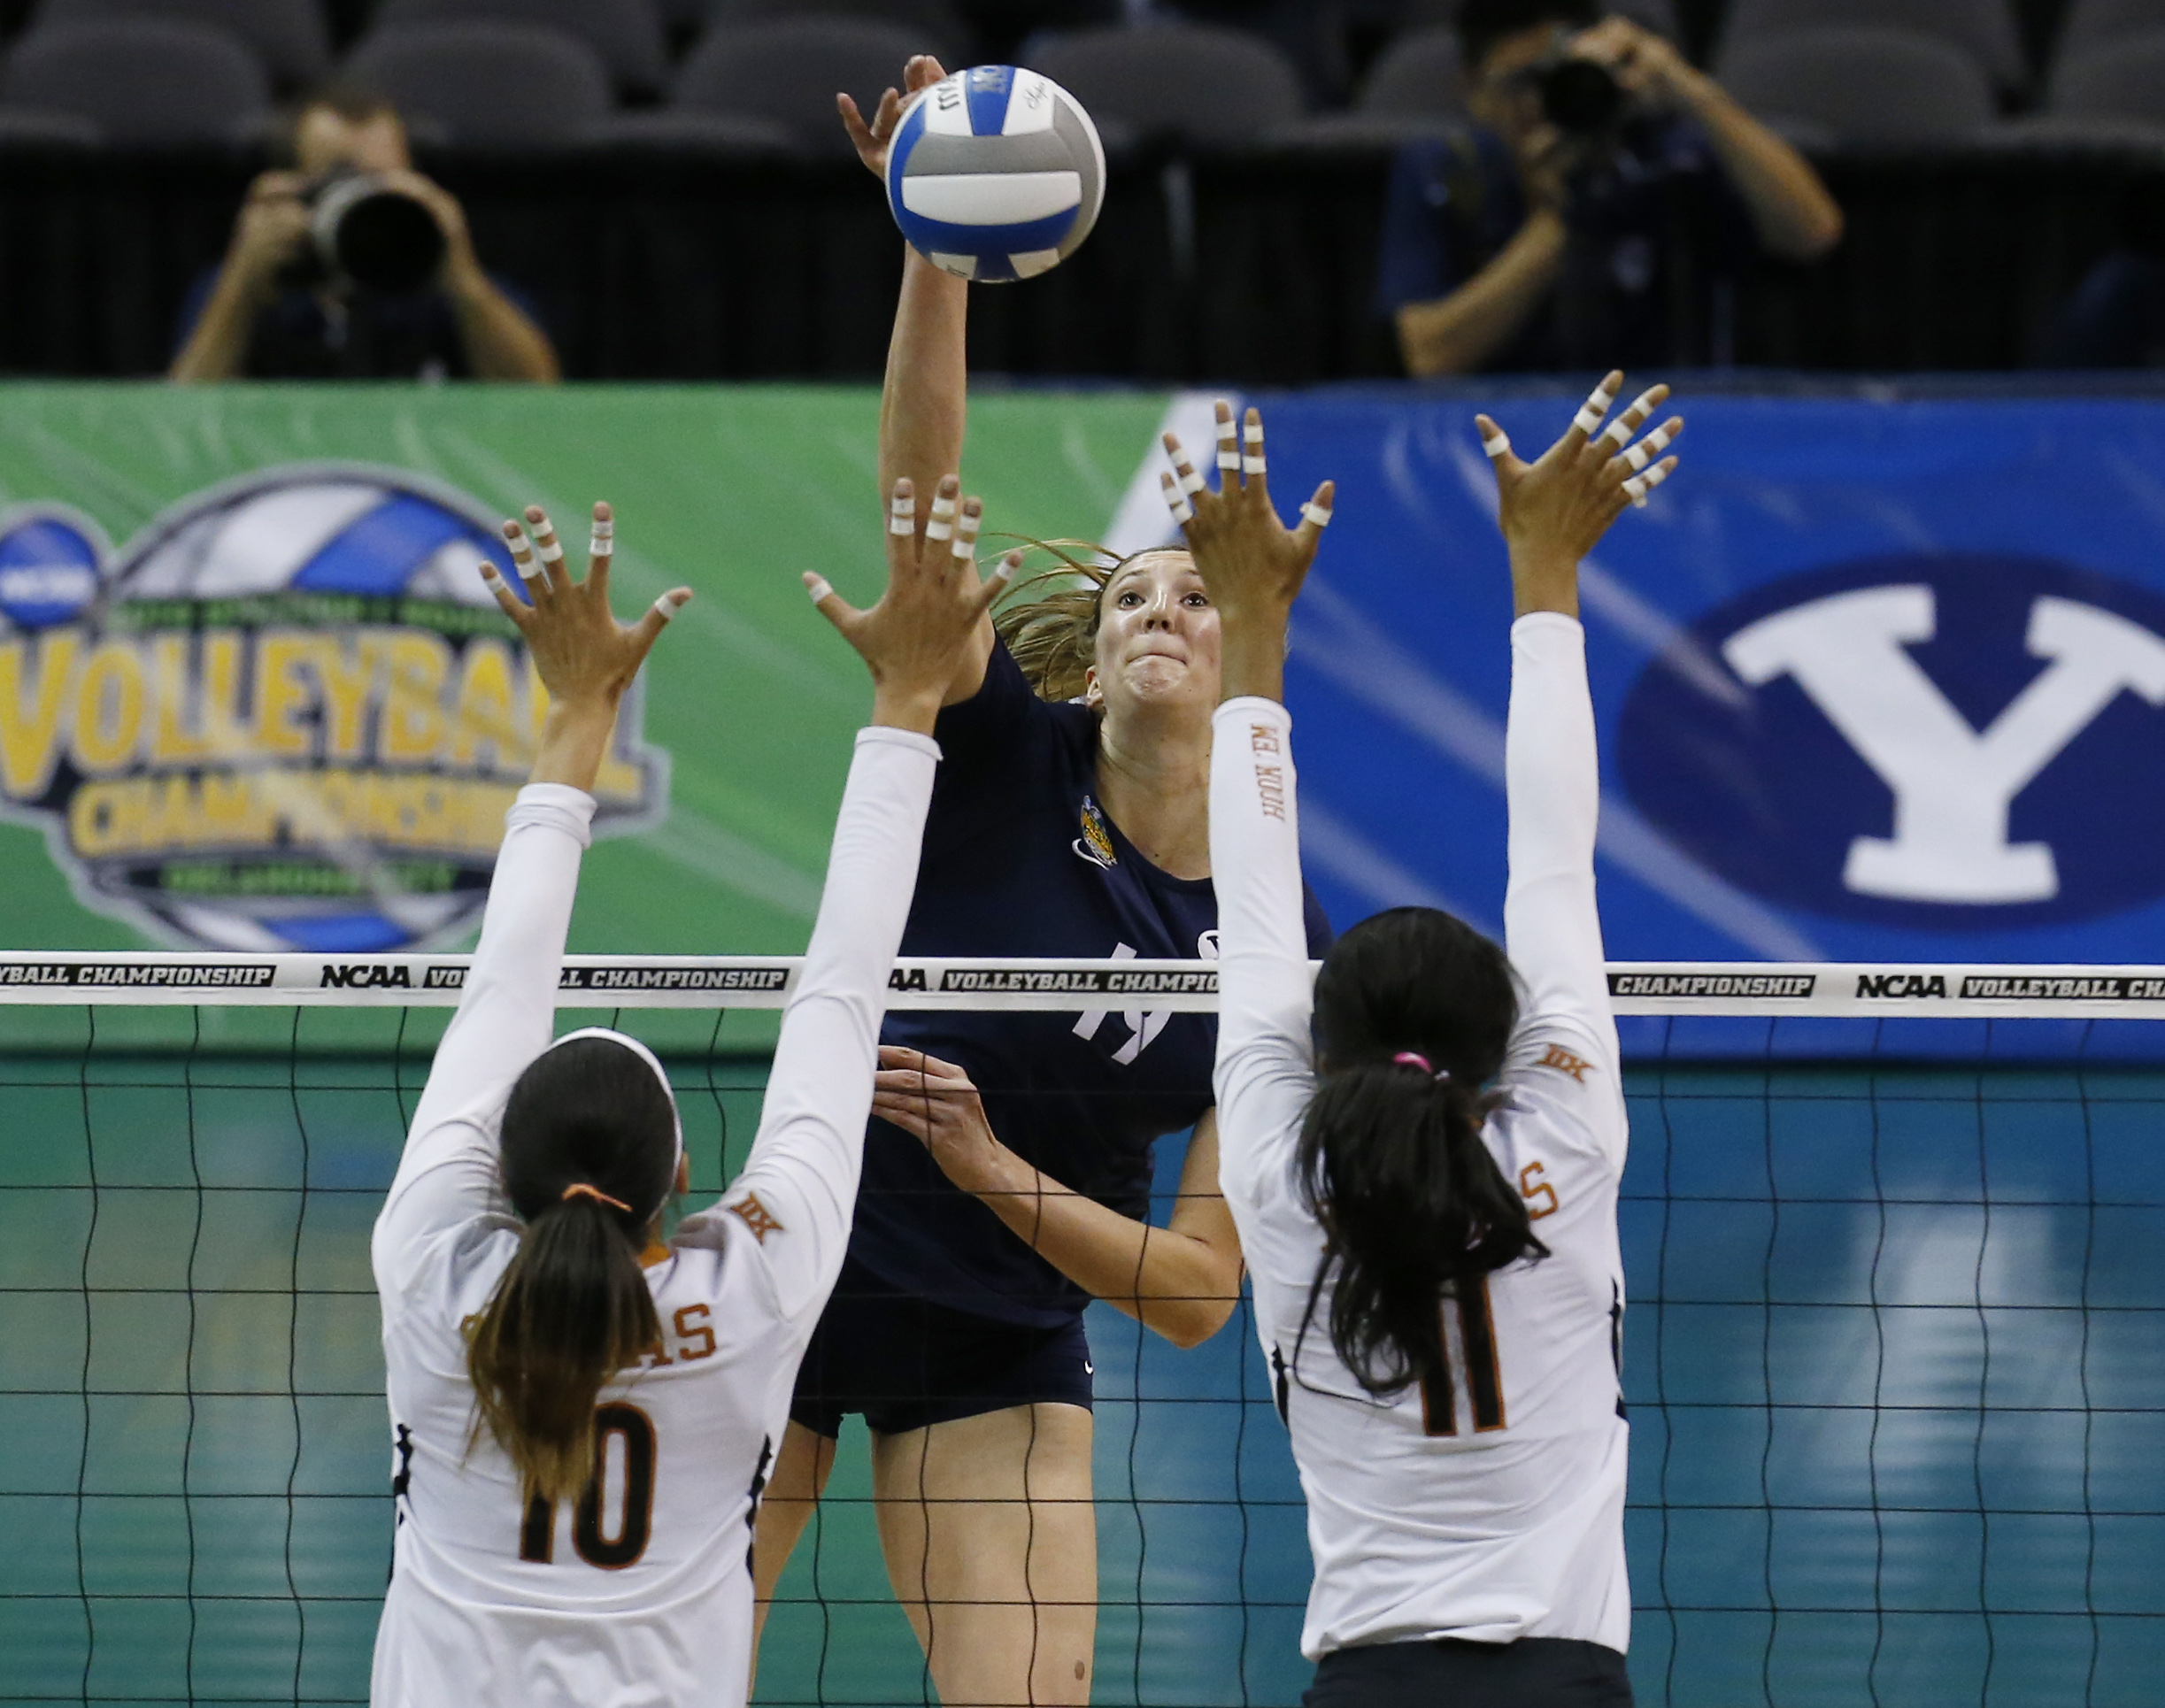 BYU's Jennifer Hamson (19) hits a kill over Texas's Haley Eckerman (10) and Chiaka Ogbogu (11) during an NCAA college volleyball tournament semifinal in Oklahoma City, Thursday, Dec. 18, 2014. (AP Photo/Sue Ogrocki)